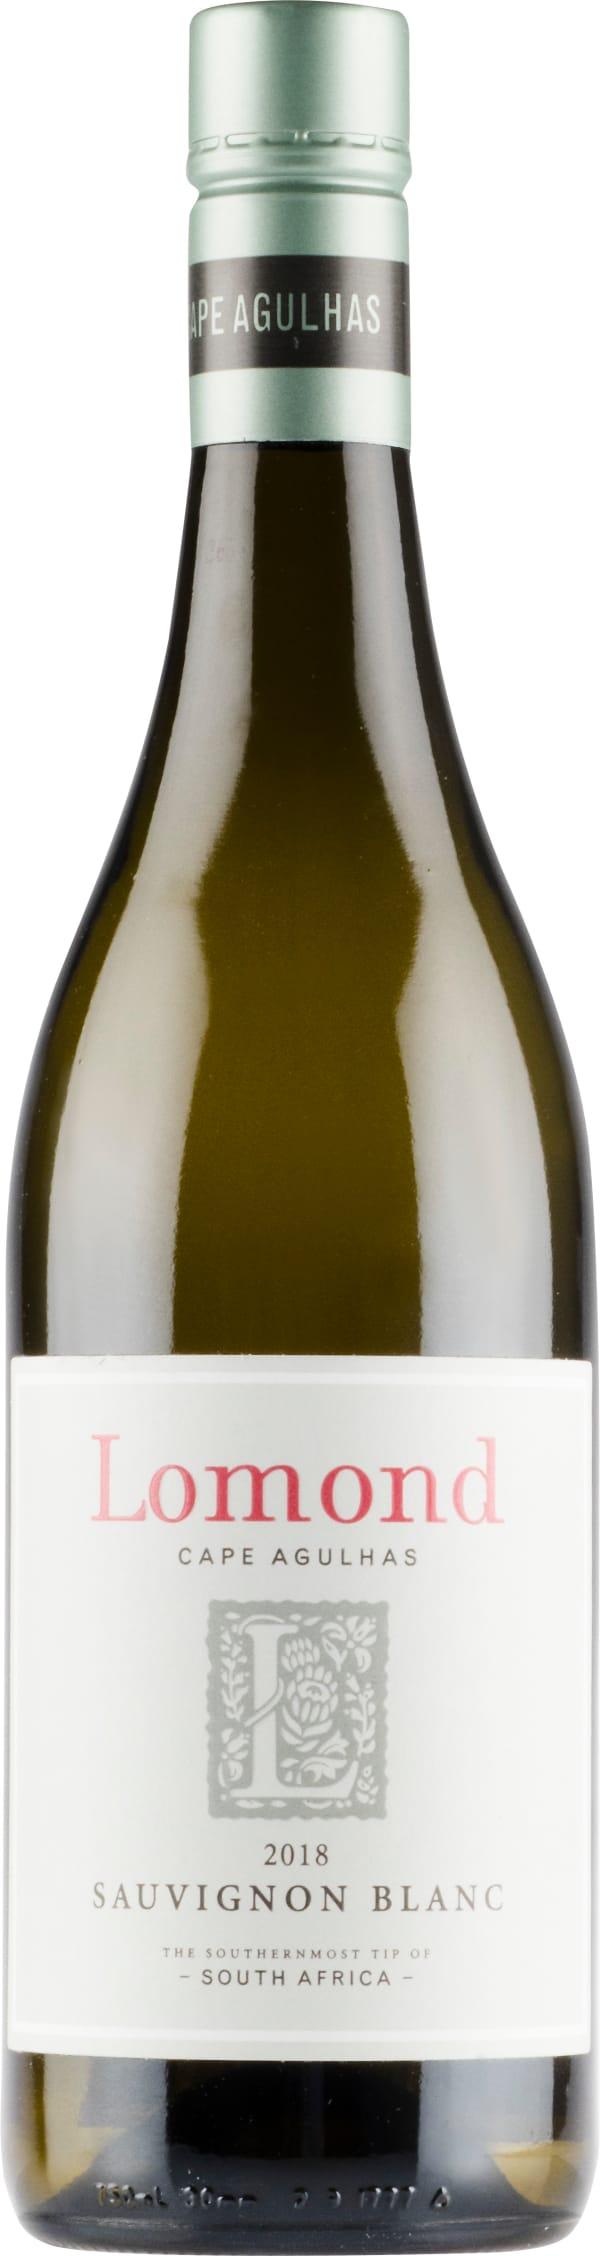 Lomond Sauvignon Blanc 2018